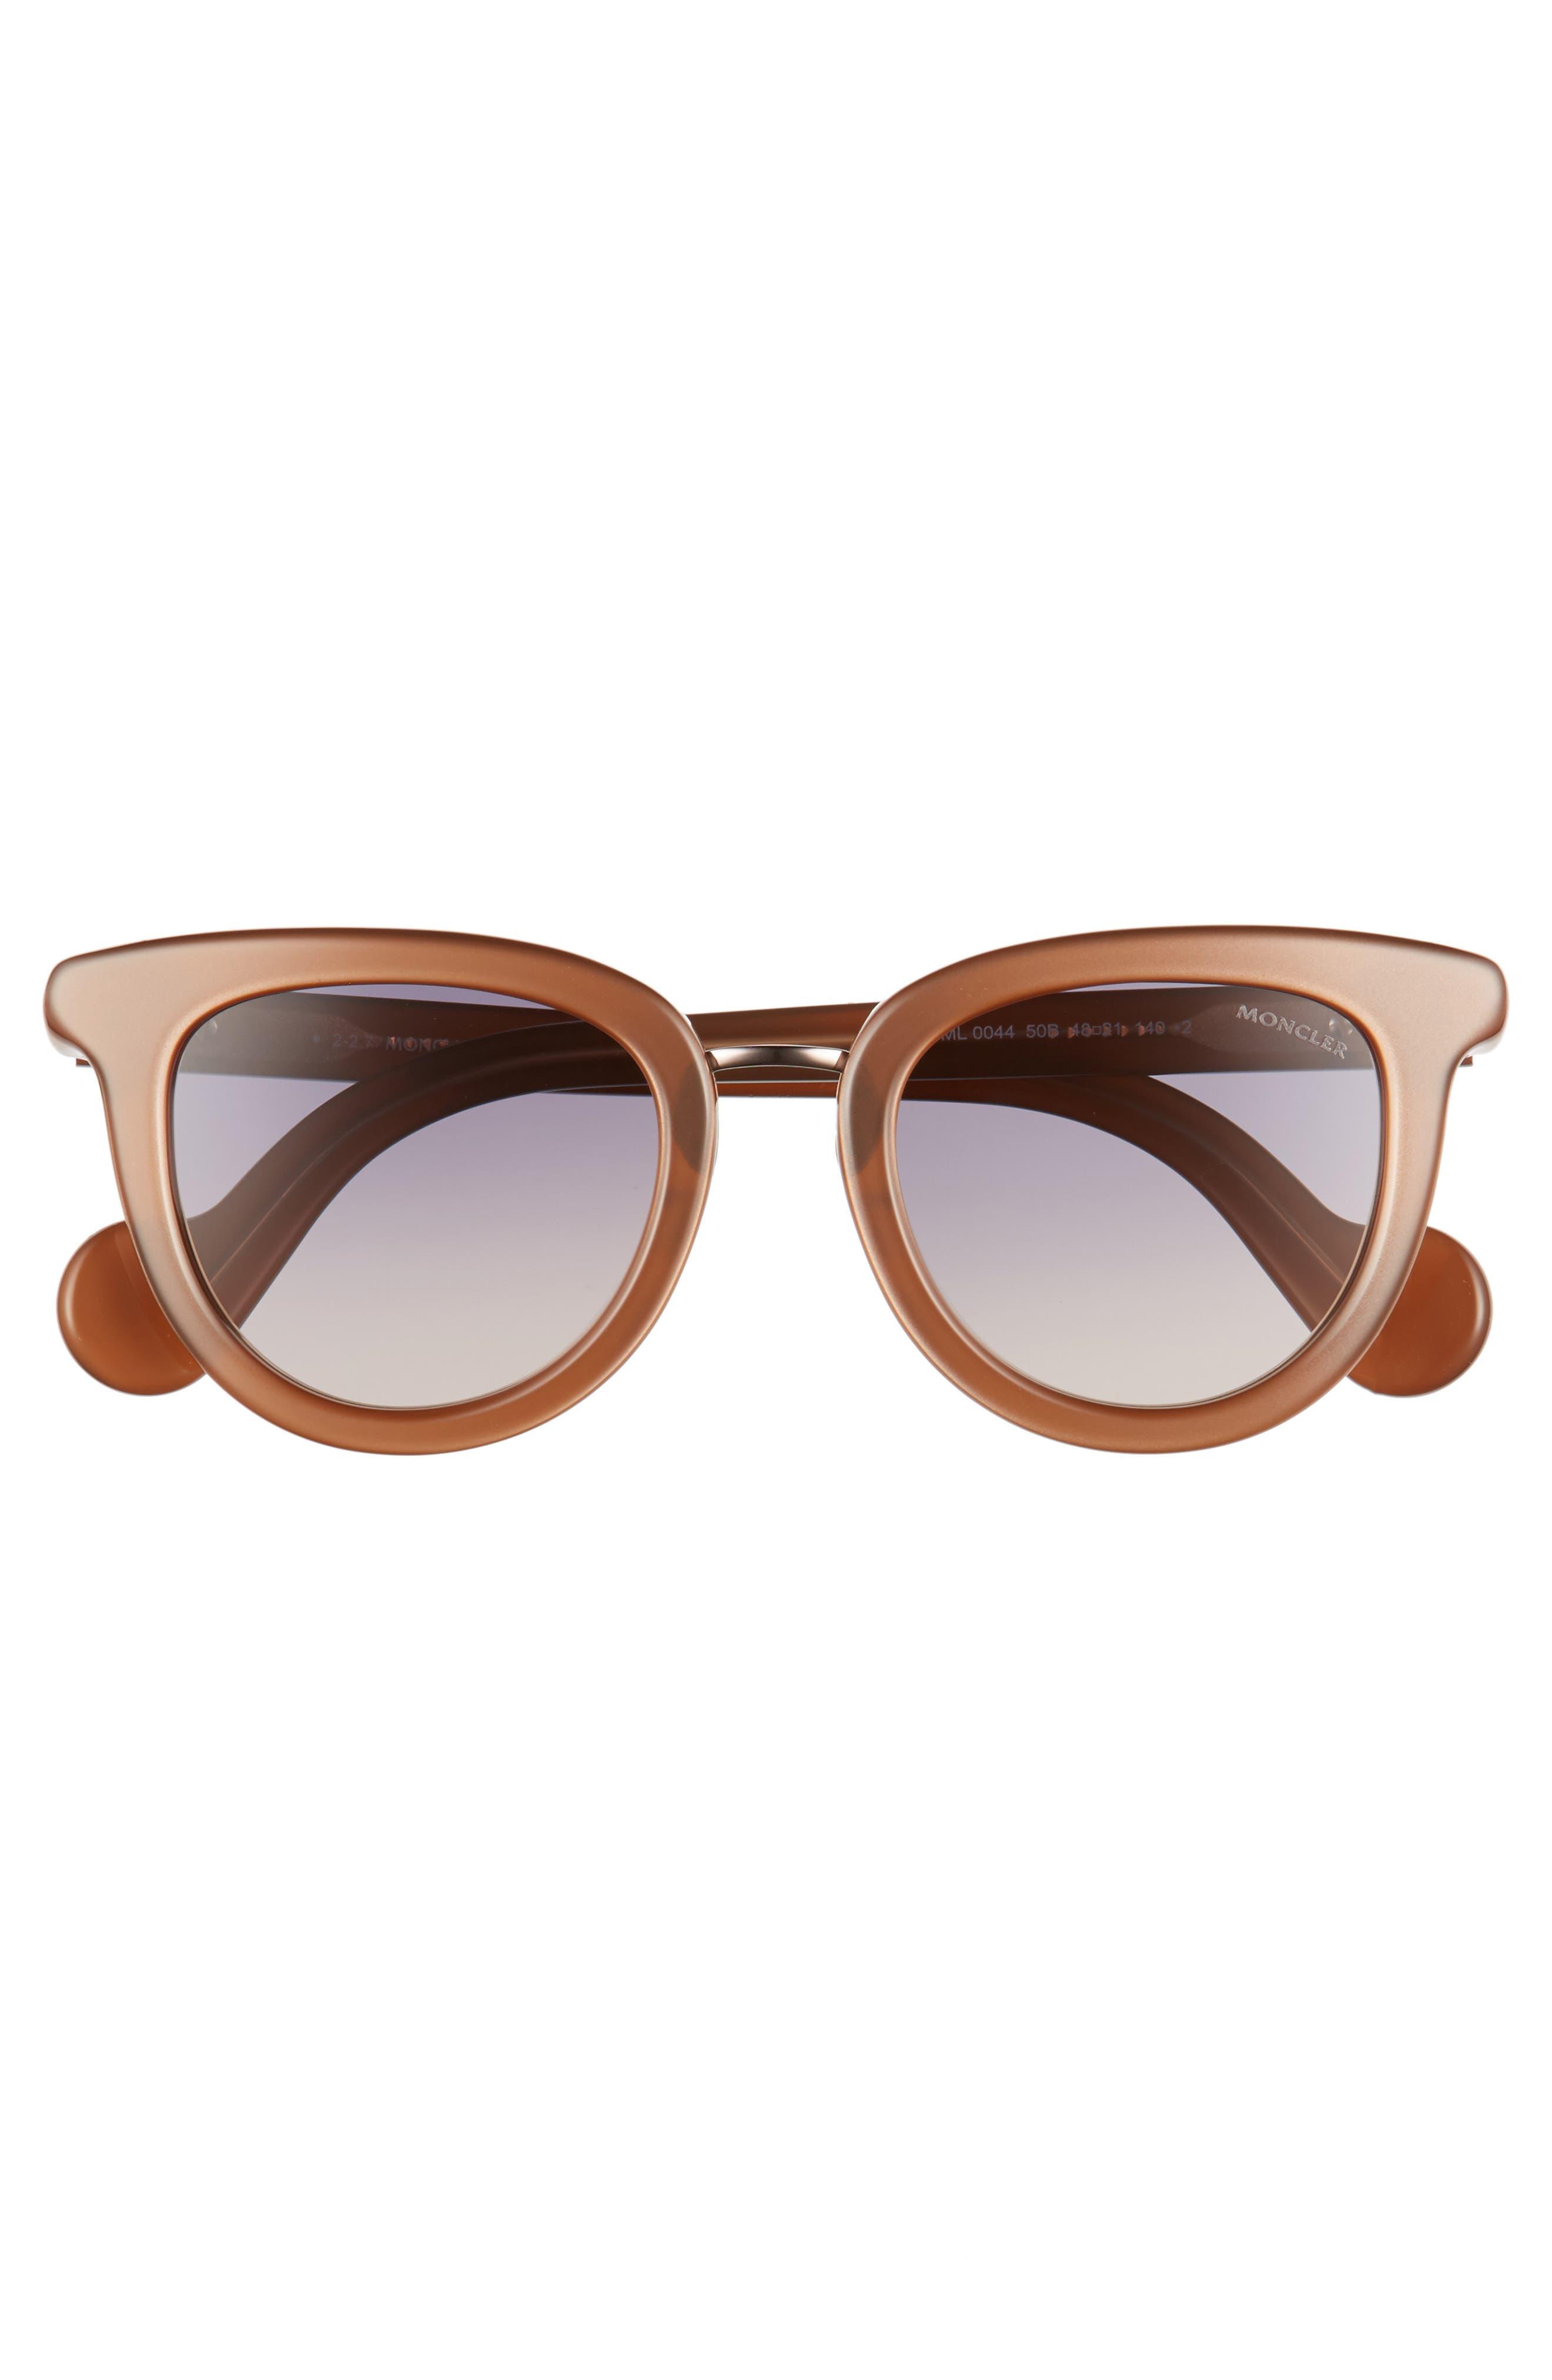 MONCLER, 48mm Cat Eye Sunglasses, Alternate thumbnail 3, color, PEARL BROWN/ GREY/ SAND